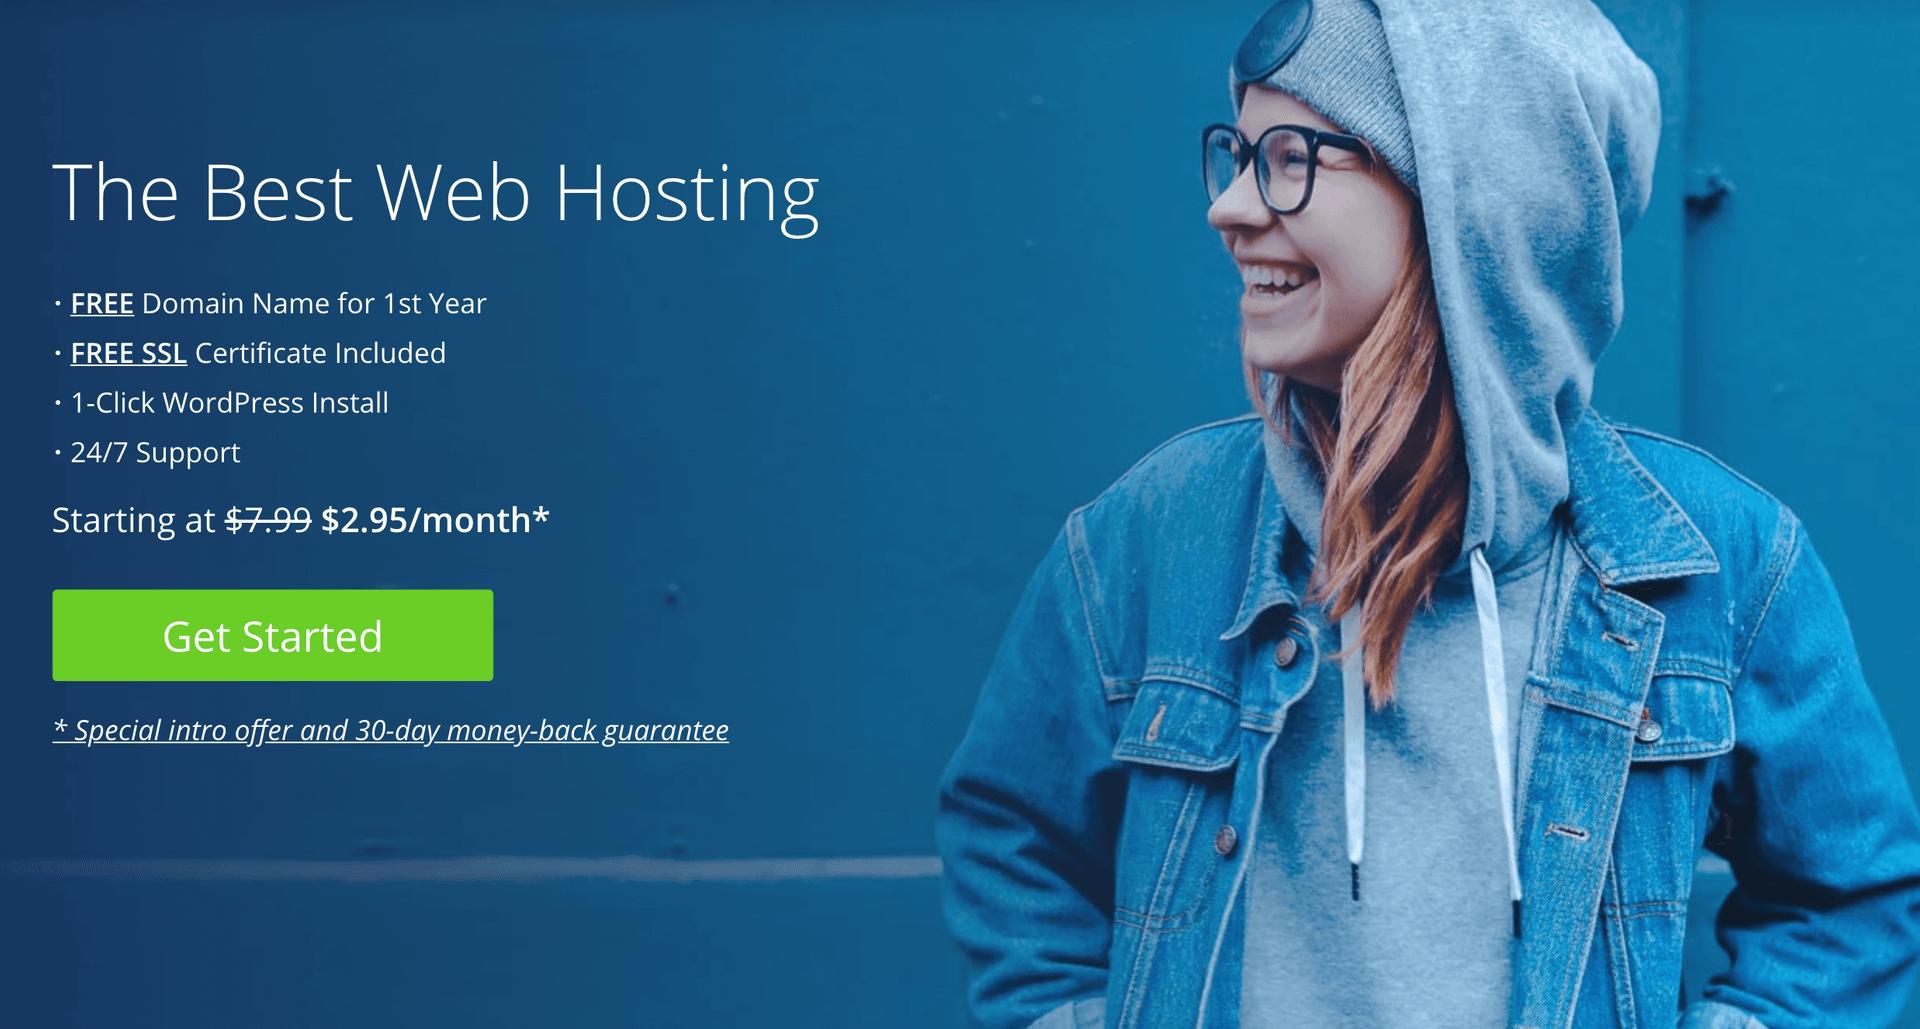 Bluehost是我们最佳共享主机的最佳选择之一。